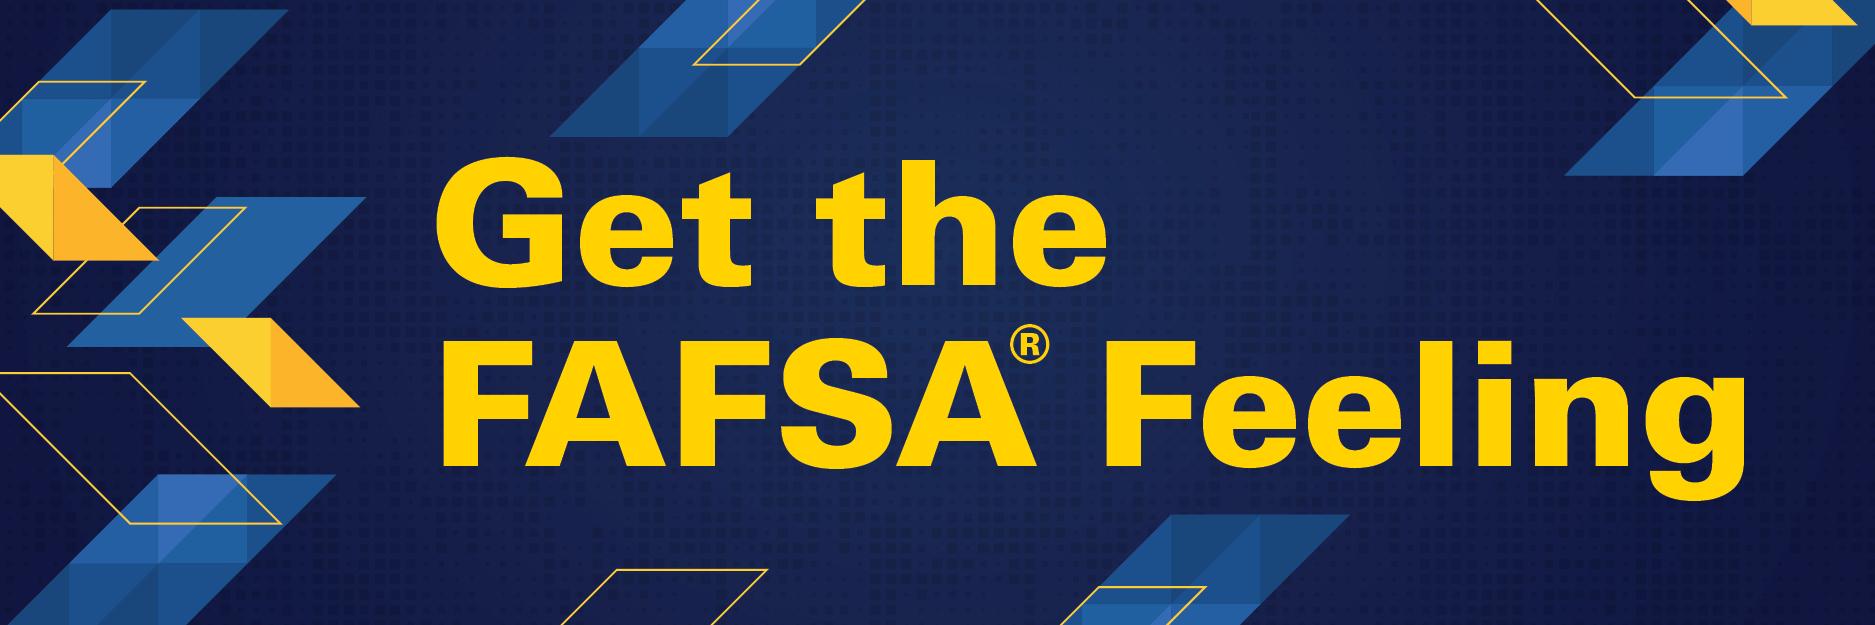 Get the FAFSA Feeling